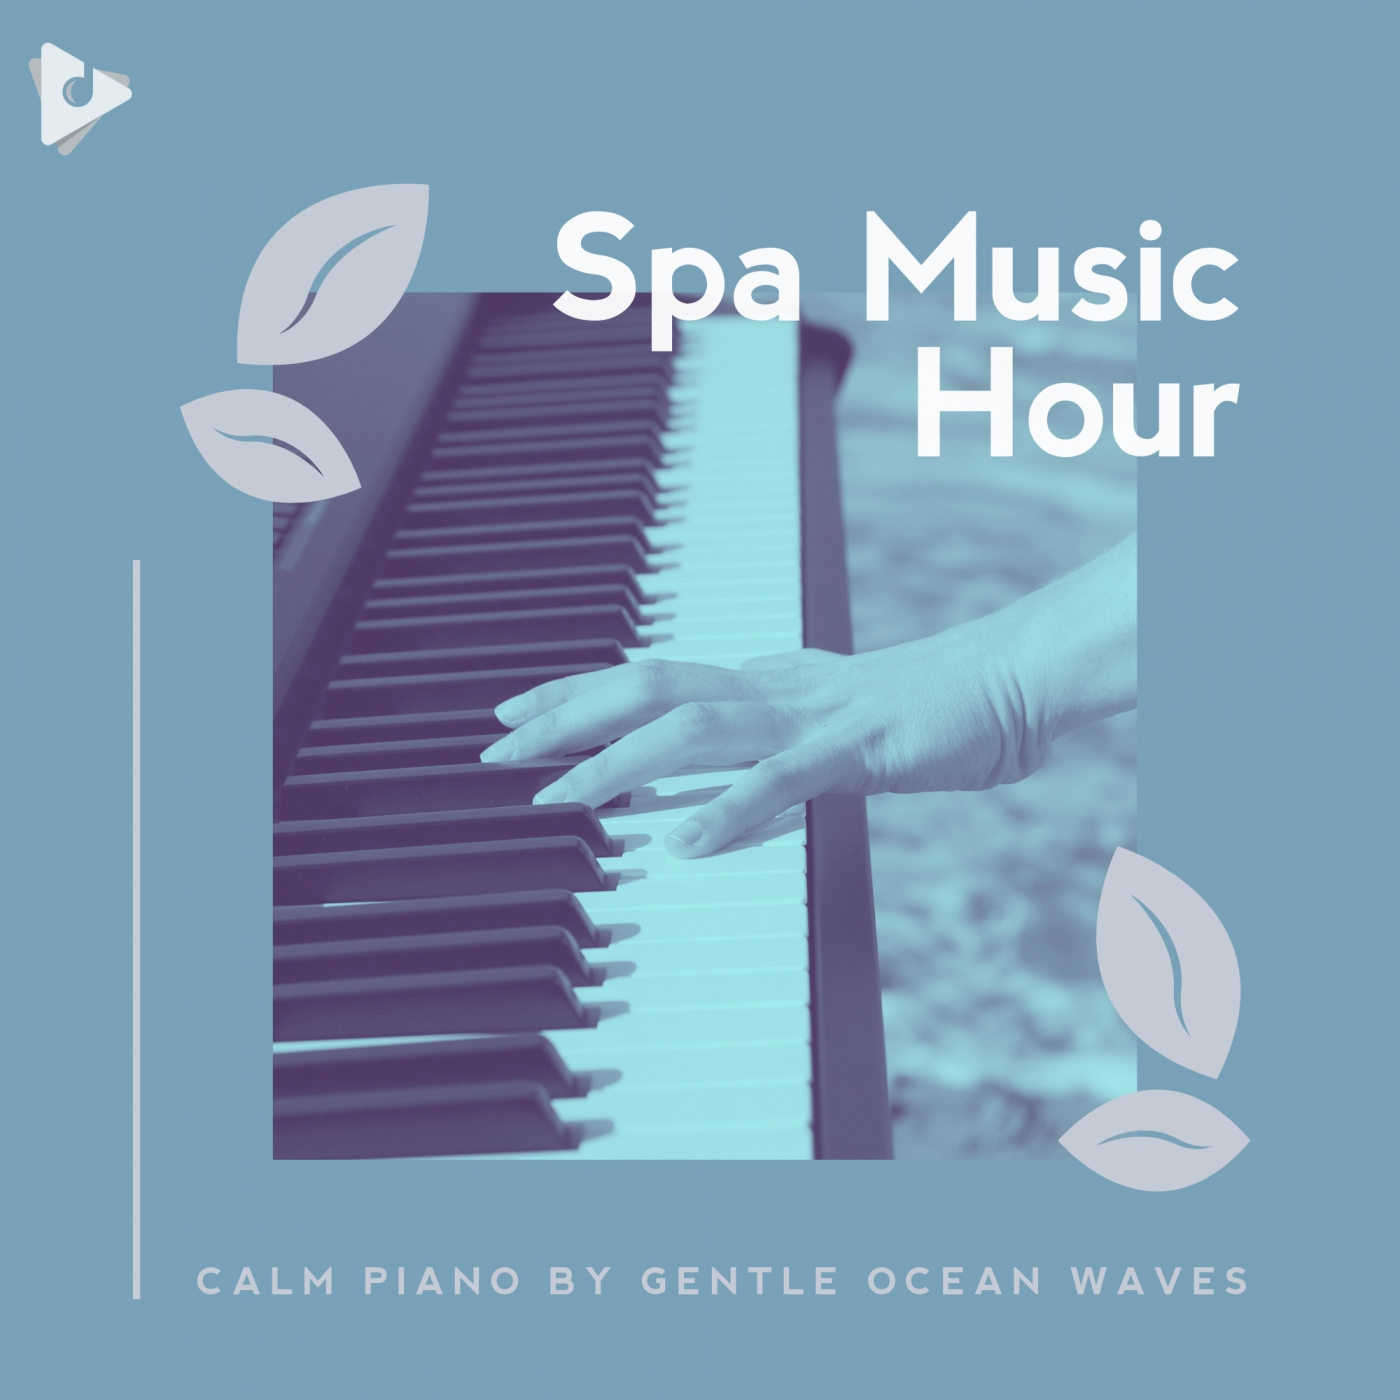 Calm Piano by Gentle Ocean Waves